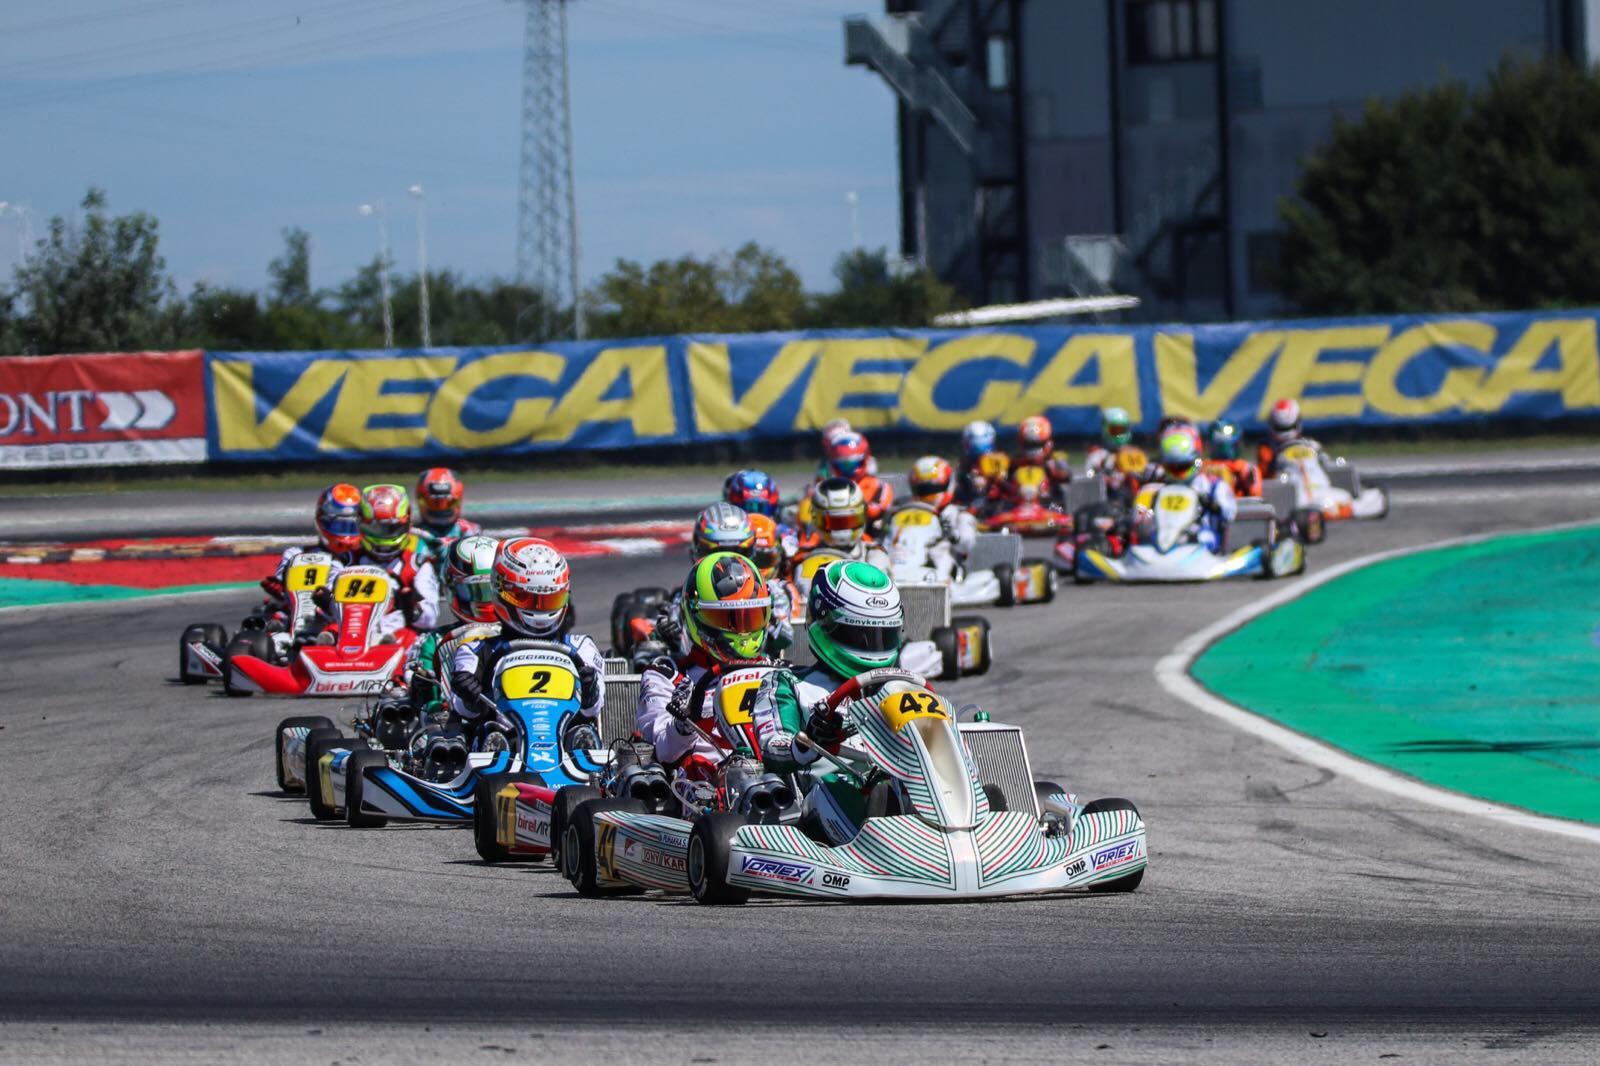 FIA Karting European Championship, Adria - Heats